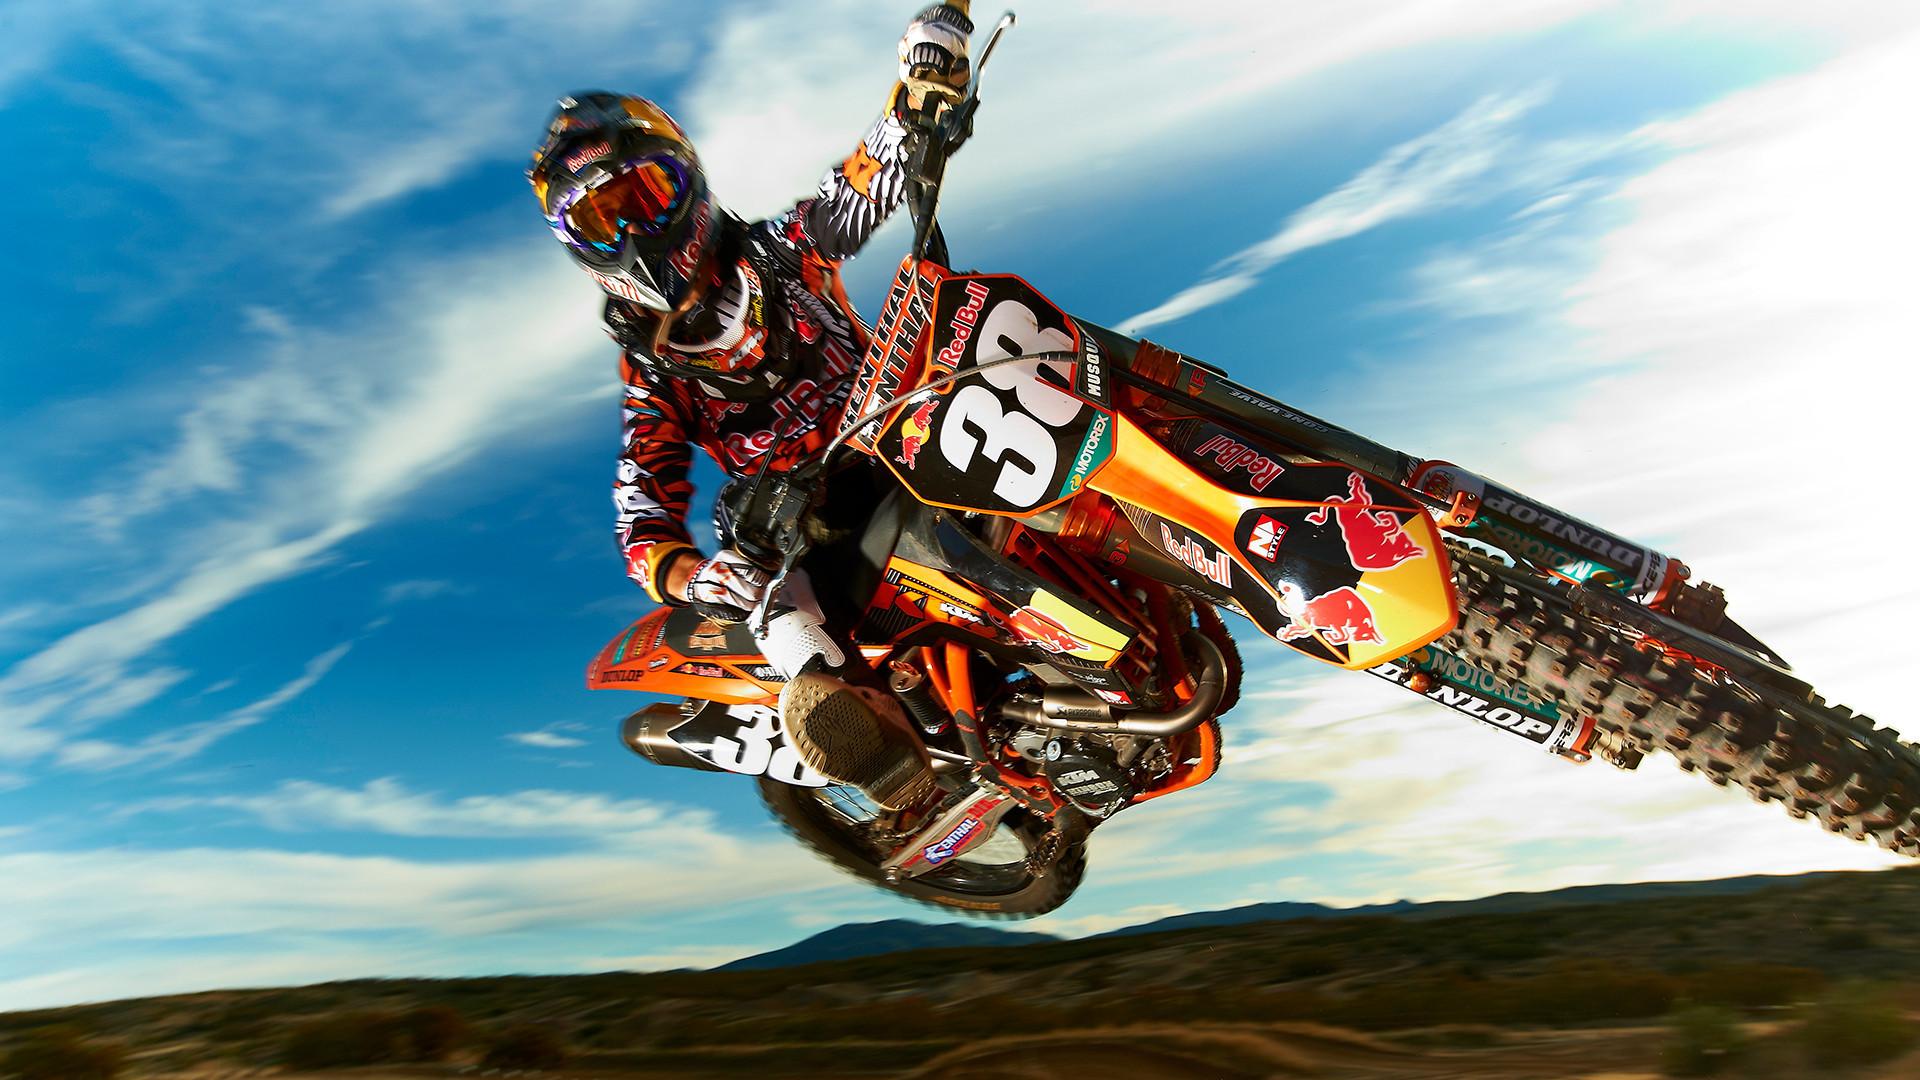 transworld motocross wallpaper hd wallpapers ›› Page 0 .